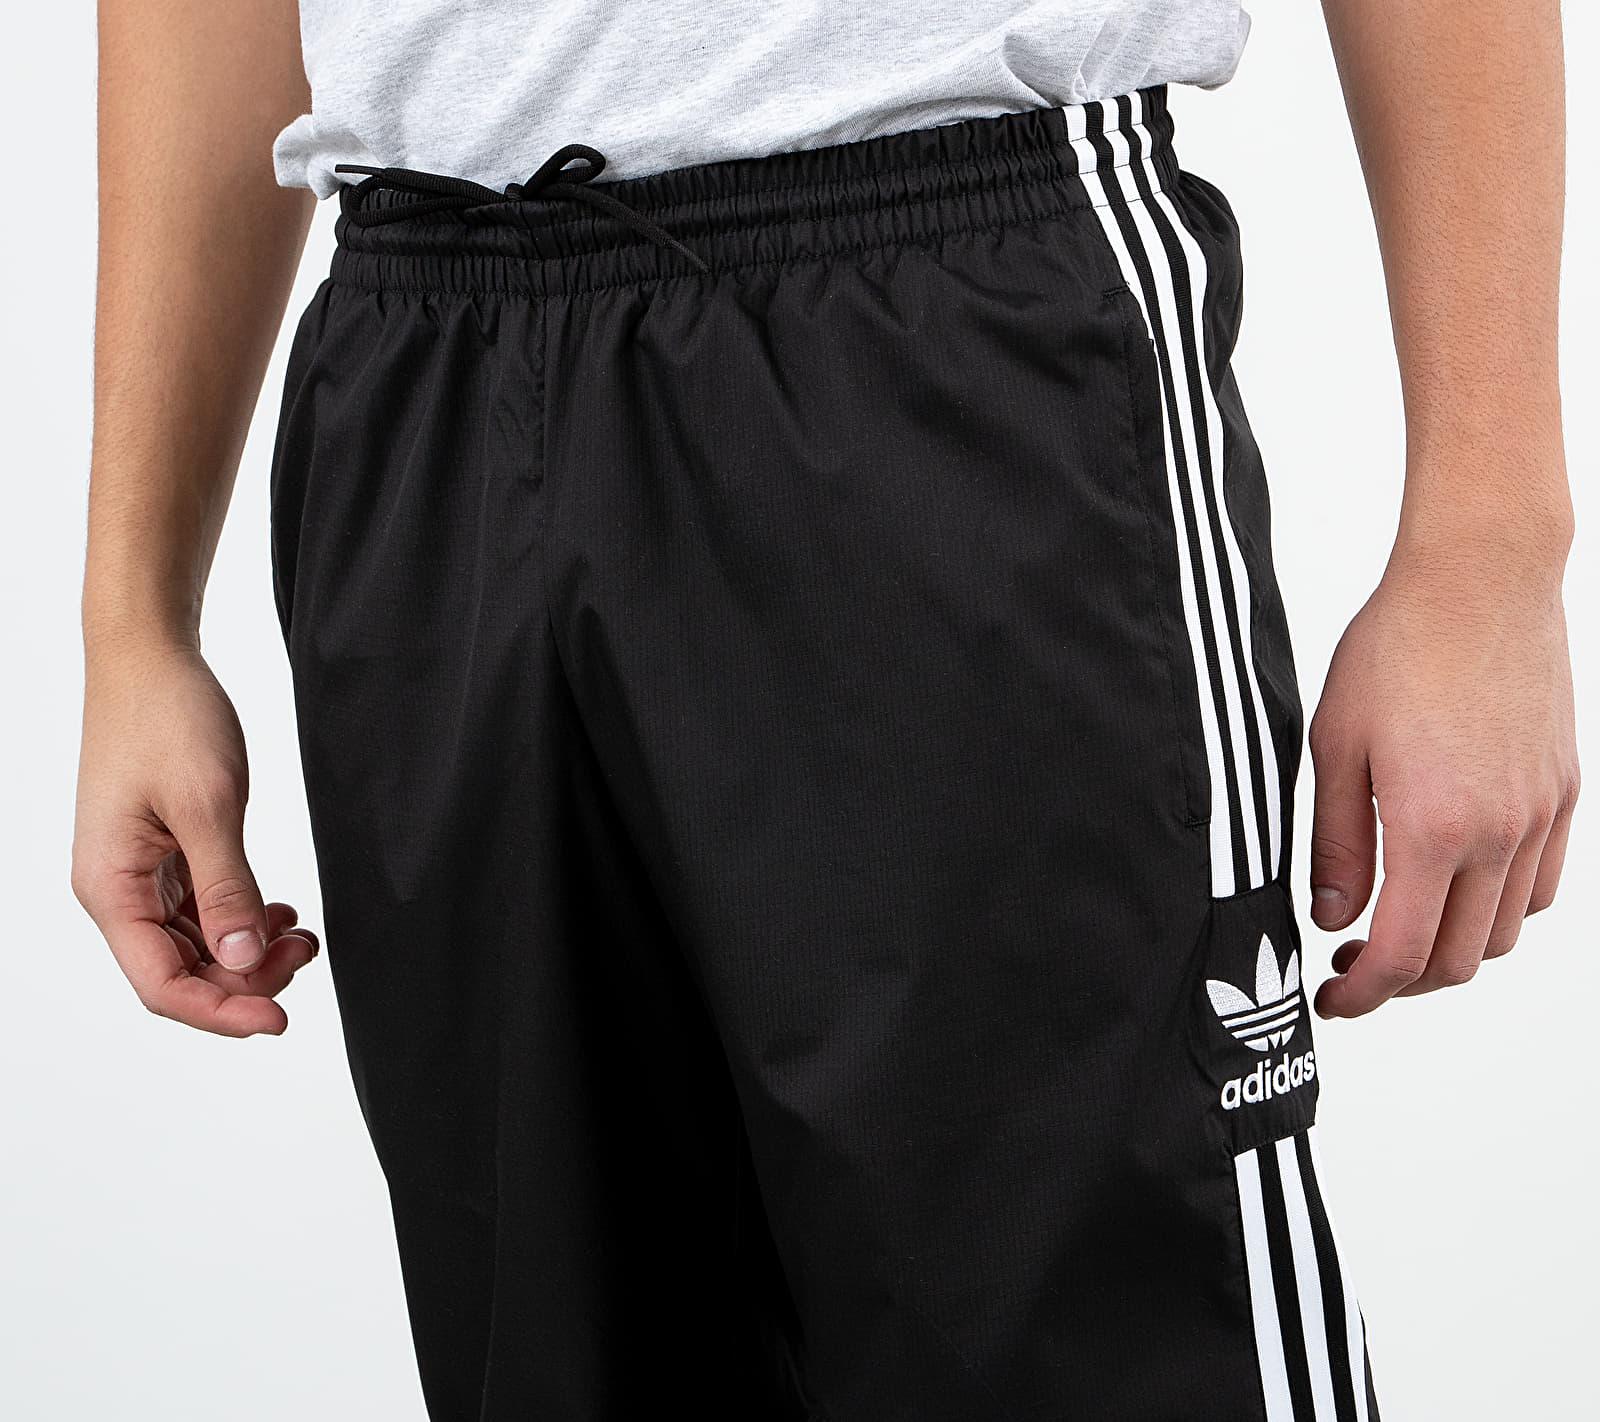 adidas Lock Up Trackpants Black